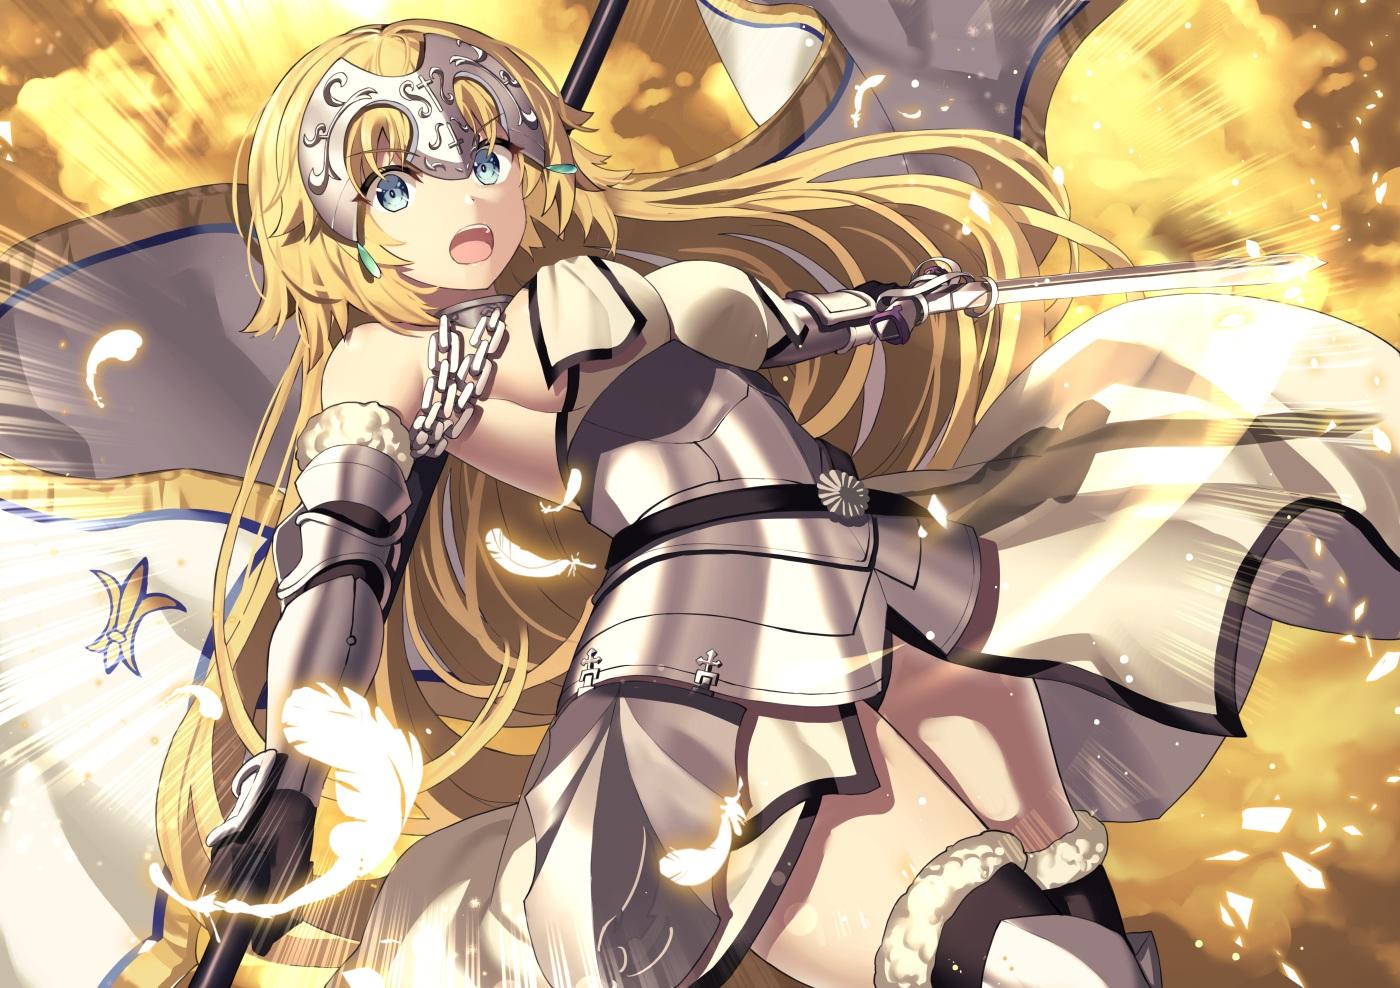 akae_neo aqua_eyes armor blonde_hair breasts chain elbow_gloves fate/grand_order fate_(series) feathers gloves headdress jeanne_d'arc_(fate) long_hair sword thighhighs weapon